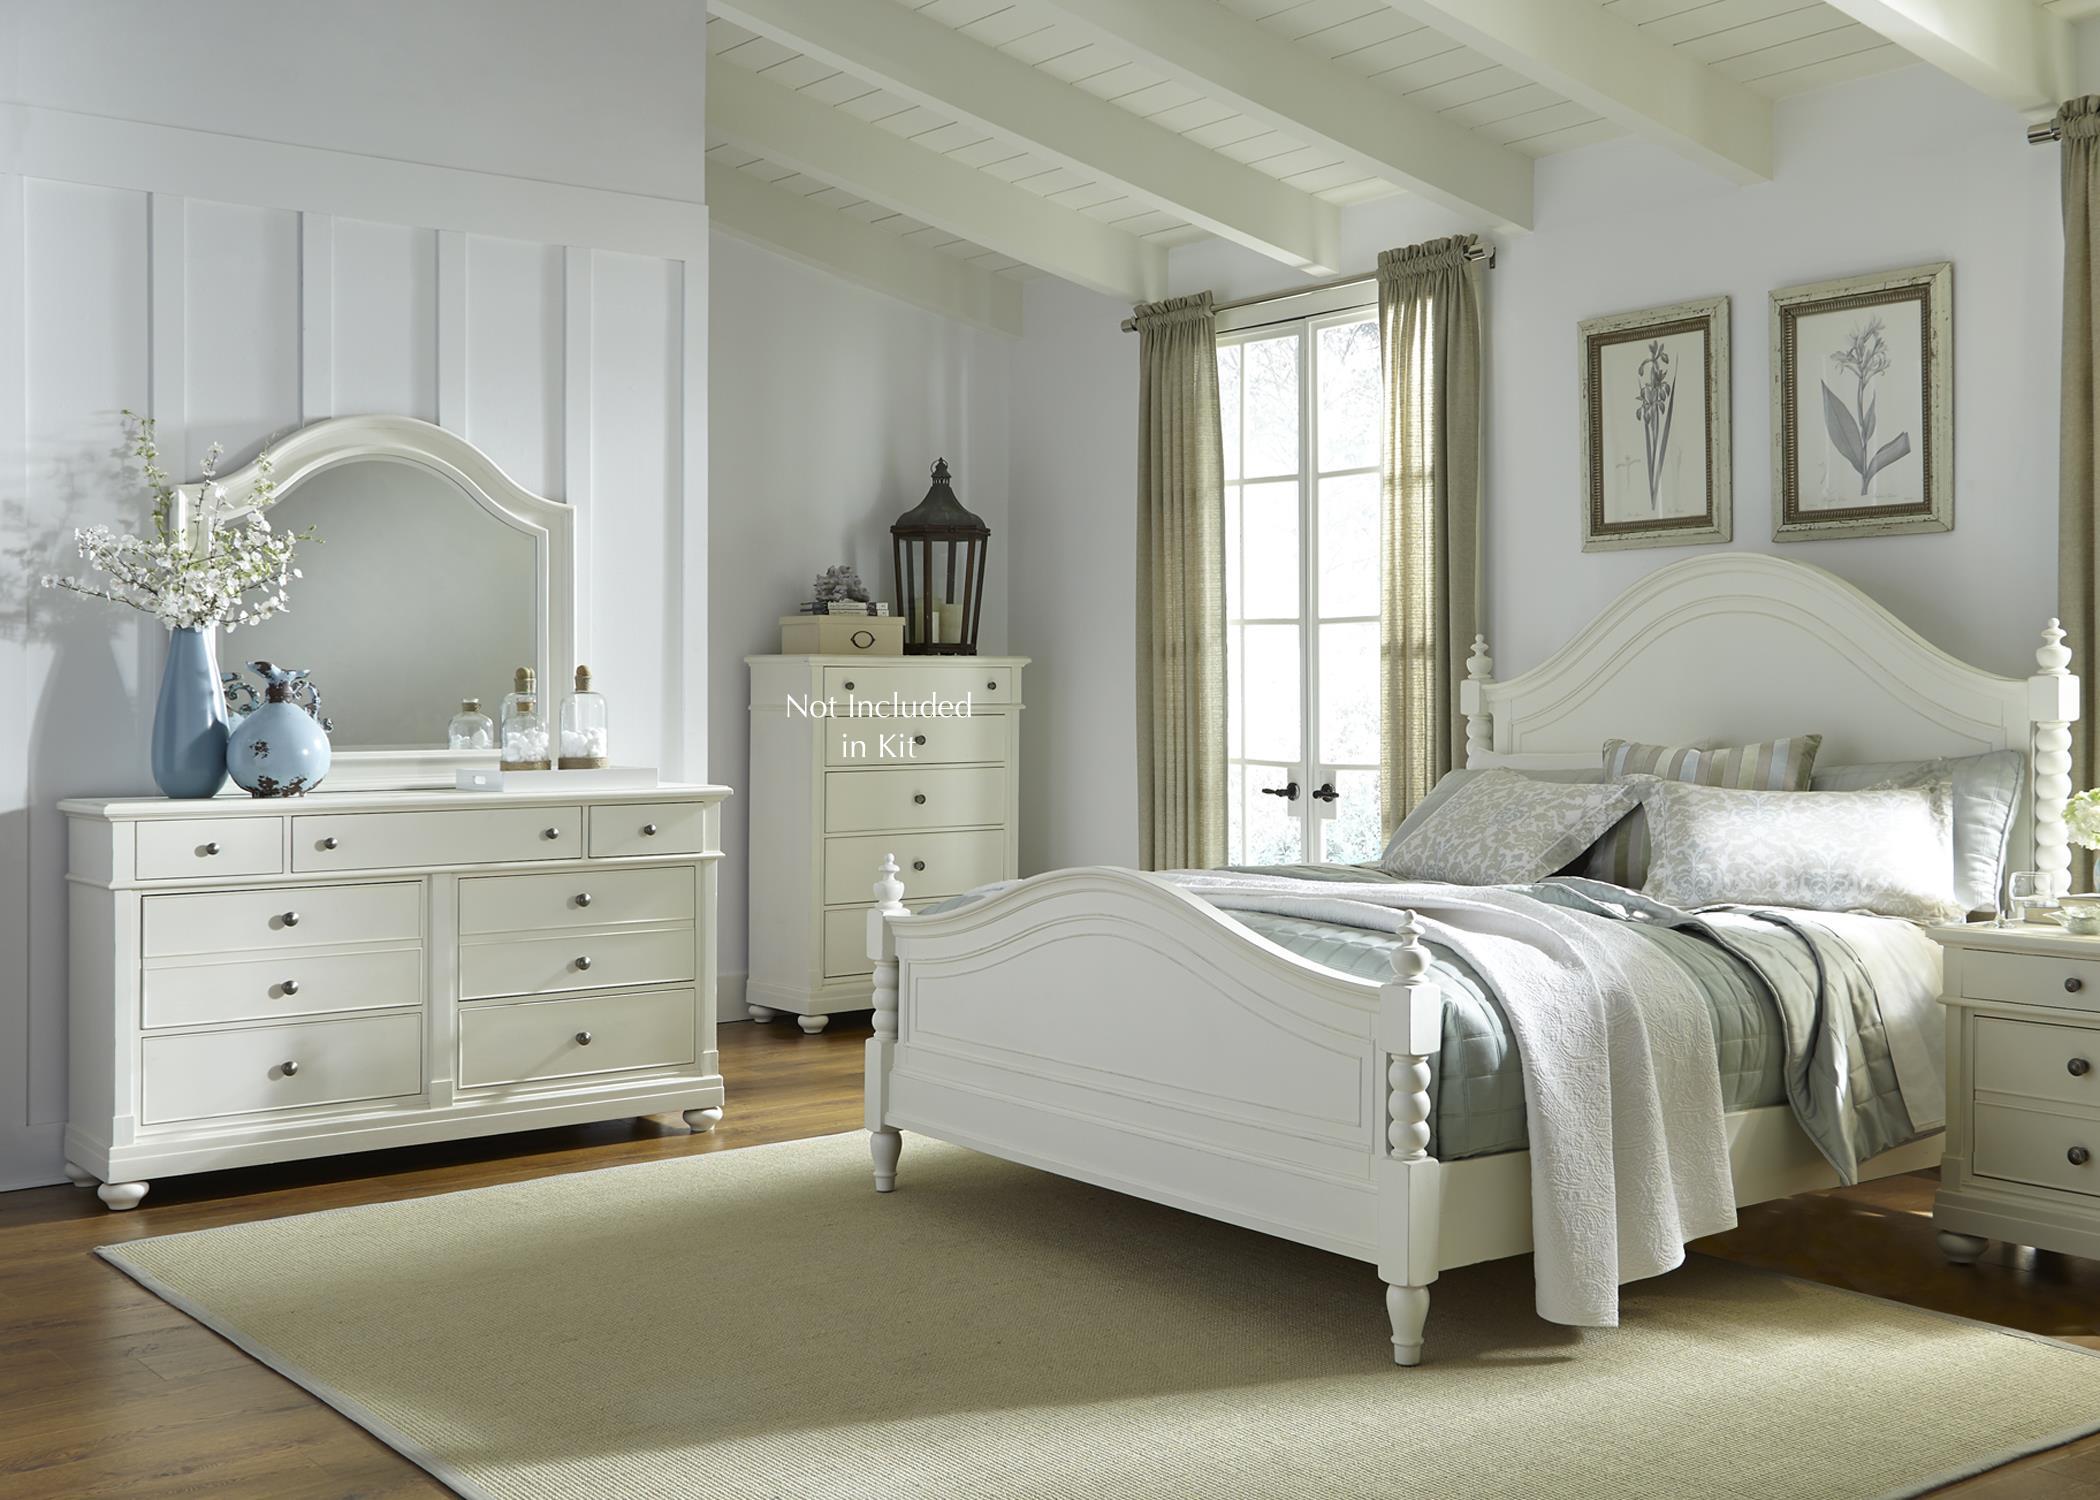 Liberty Furniture Harbor View Queen Bedroom Group - Item Number: 631-BR-QPSDMN